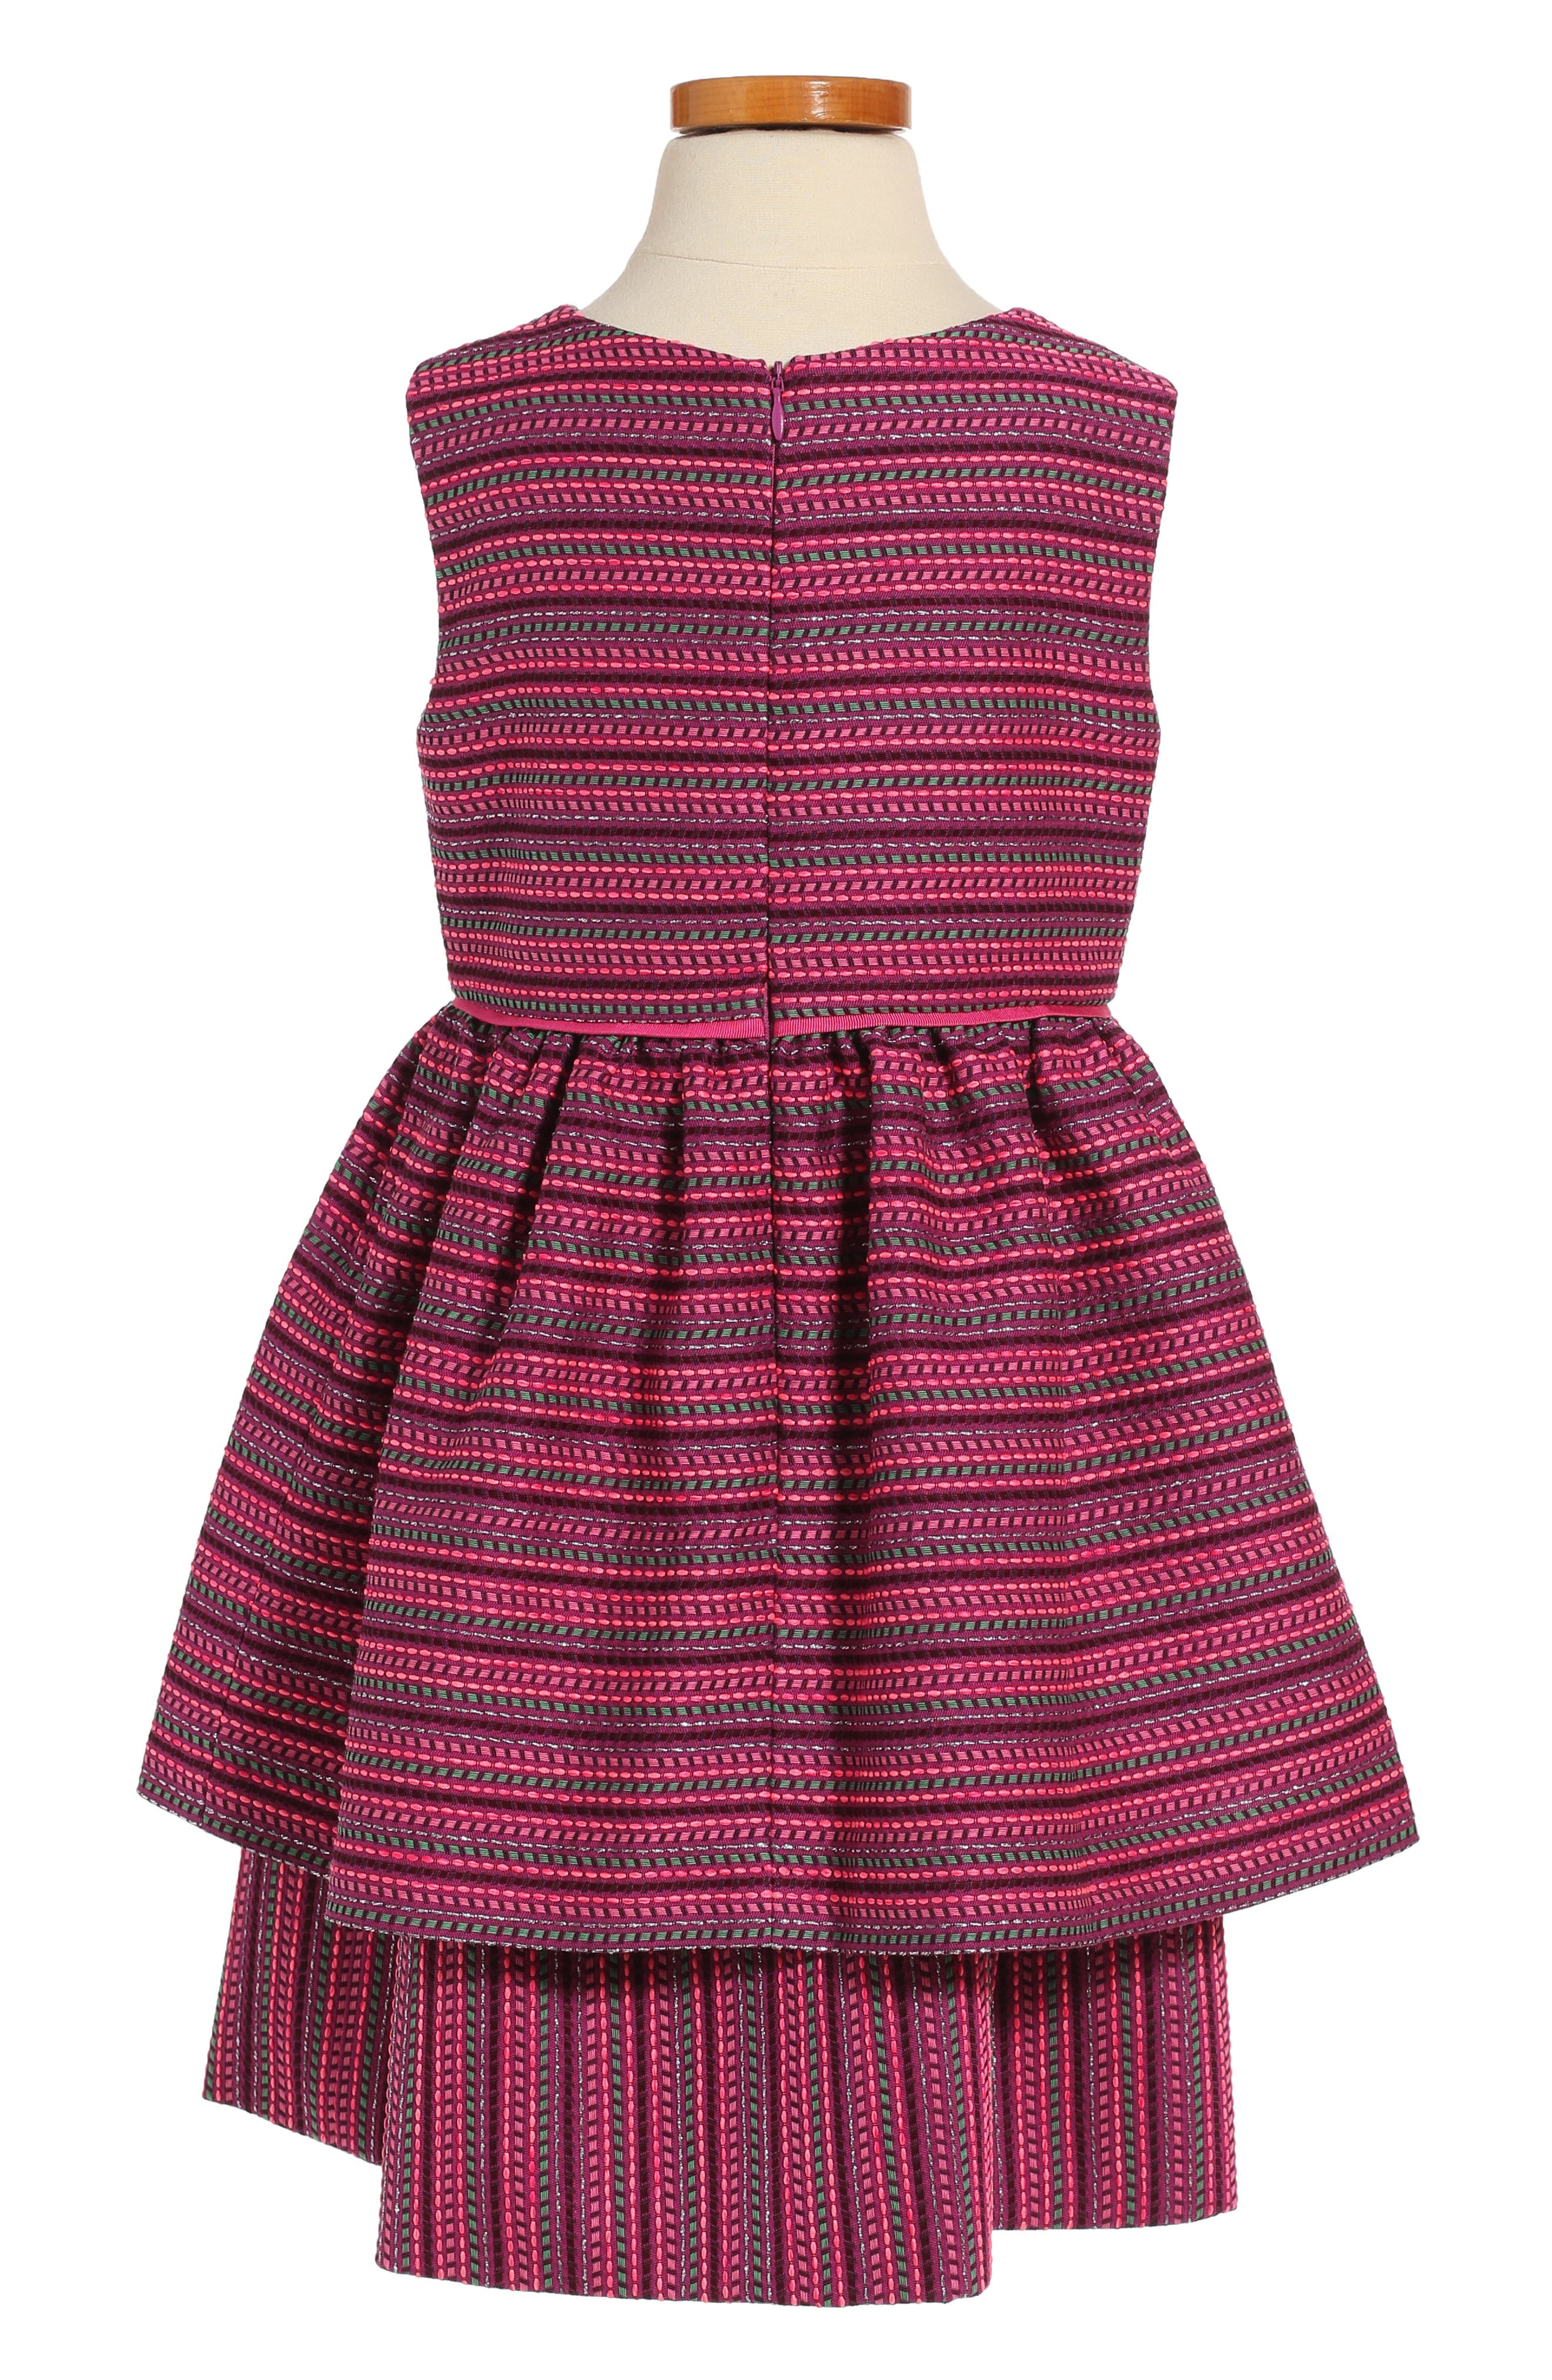 Tiered Sleeveless Dress,                             Alternate thumbnail 2, color,